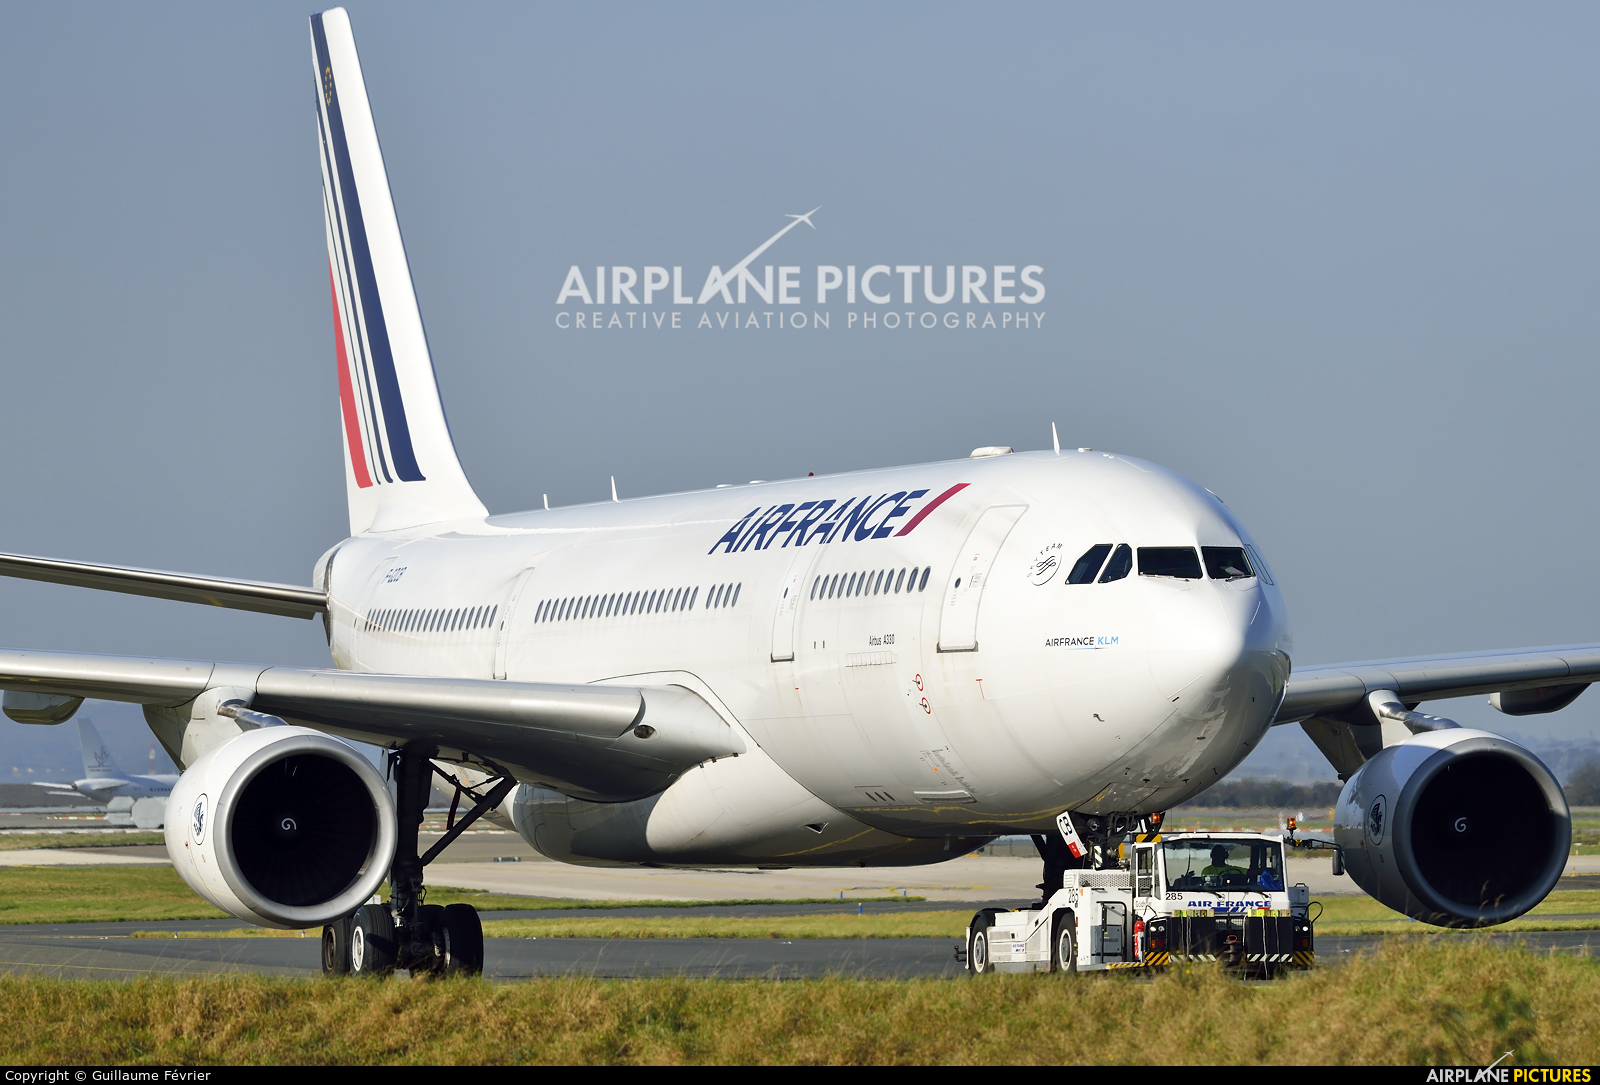 Air France F-GZCB aircraft at Paris - Charles de Gaulle